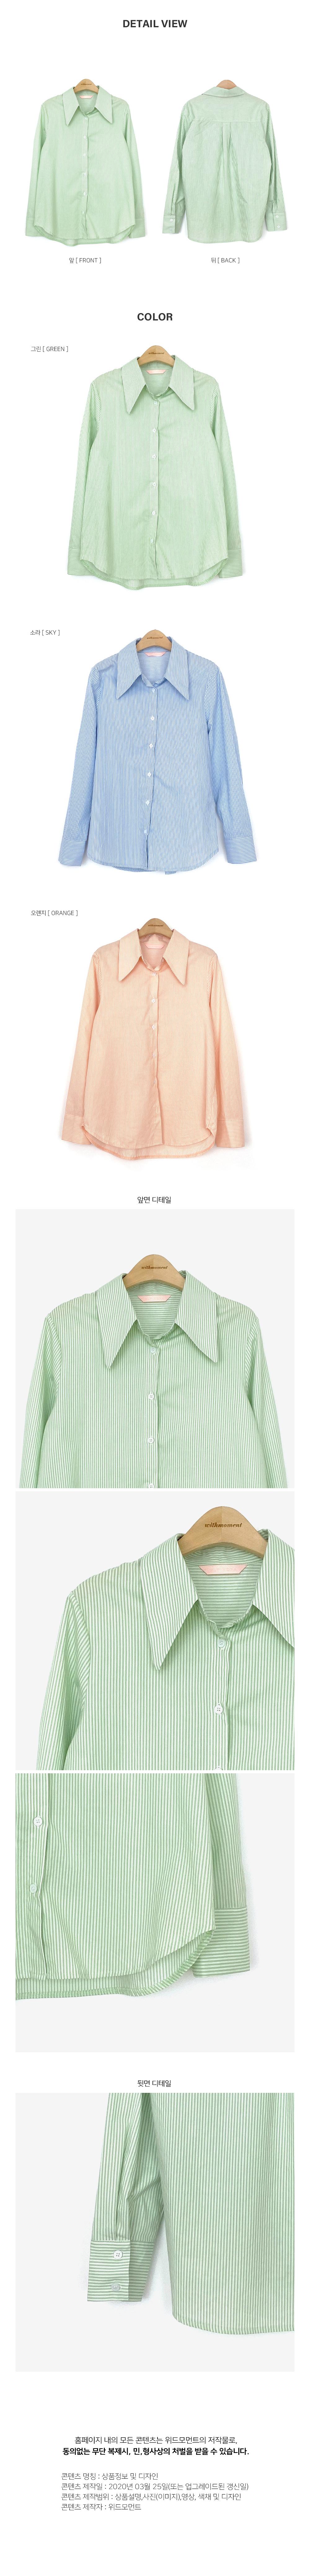 Collar point shirt